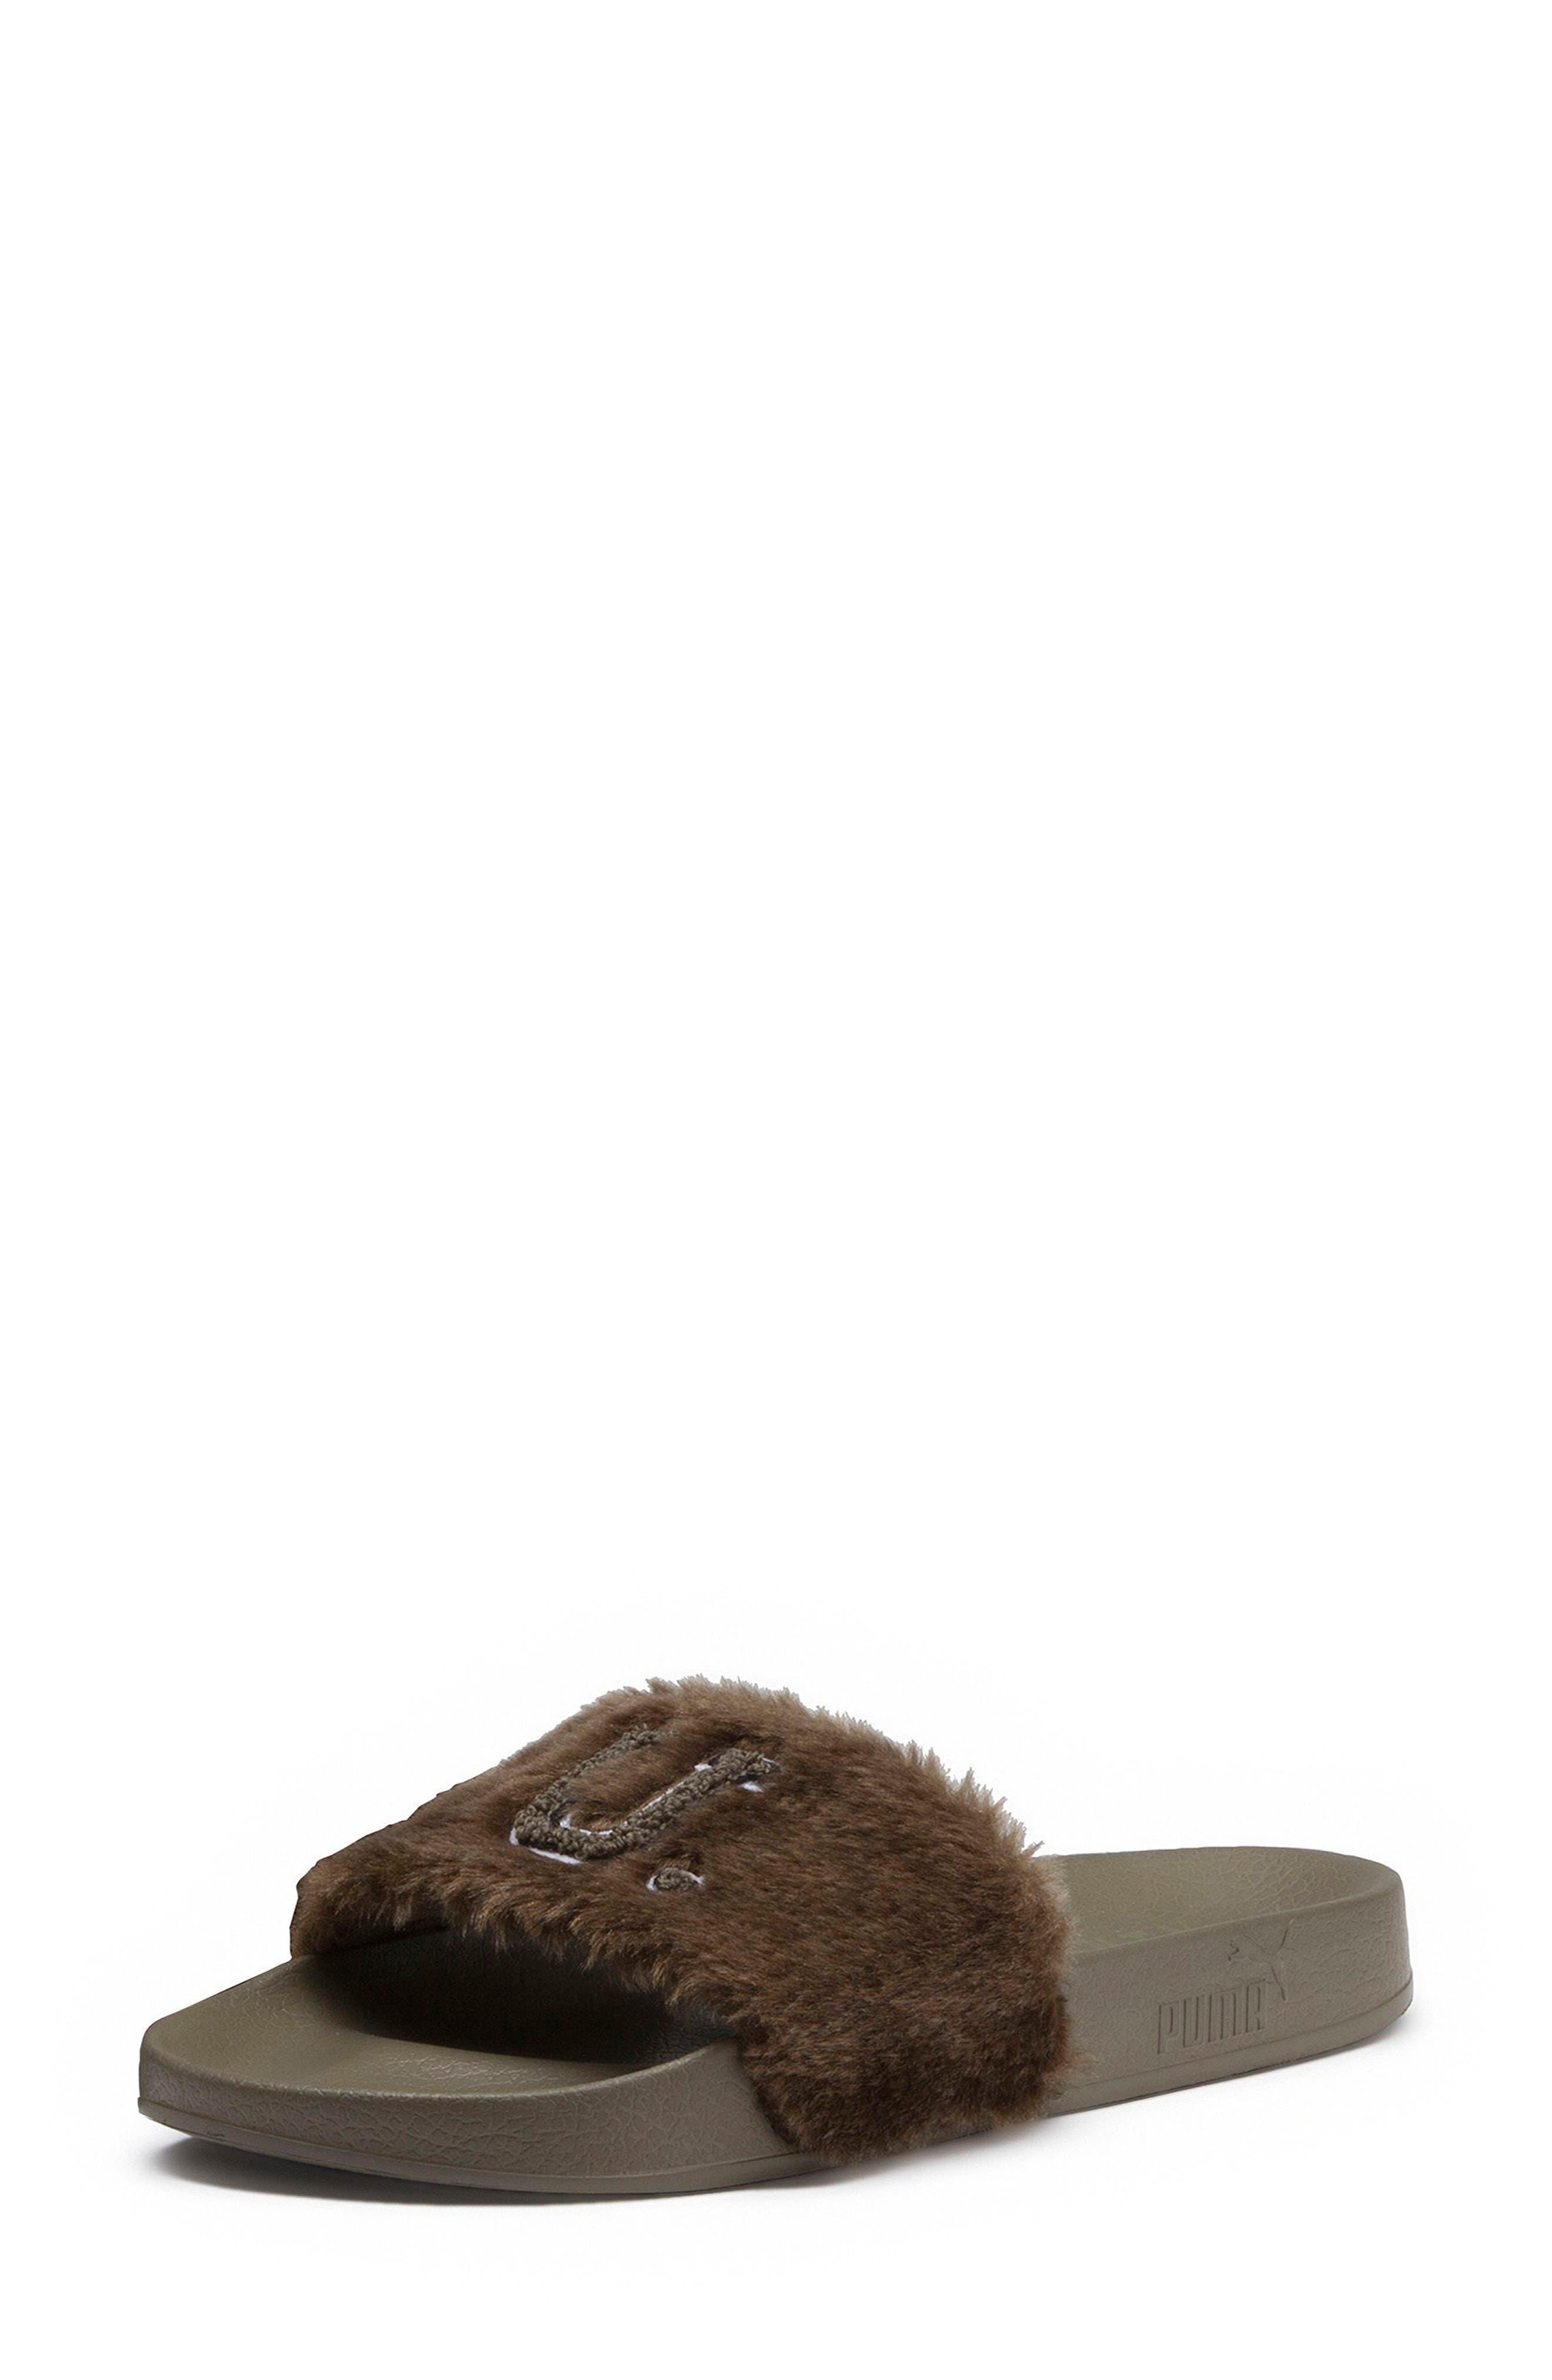 FENTY PUMA by Rihanna Lead Cat Slide Sandals,                             Alternate thumbnail 3, color,                             Burnt Olive - Puma Black